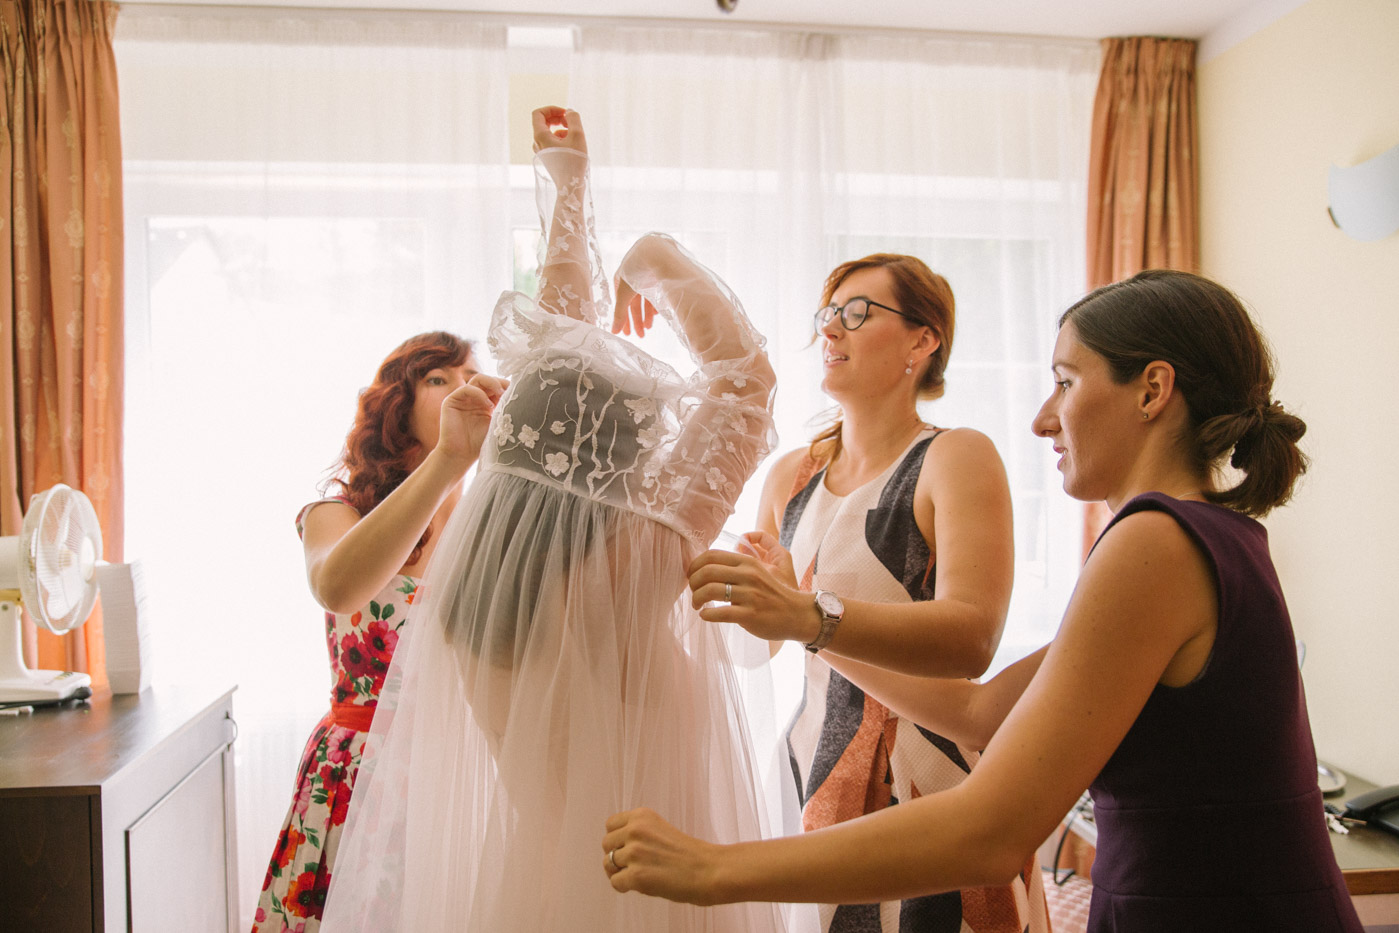 Ruzove svatebni saty | Svatba Lasakuv Mlyn | Marie Mukařovská